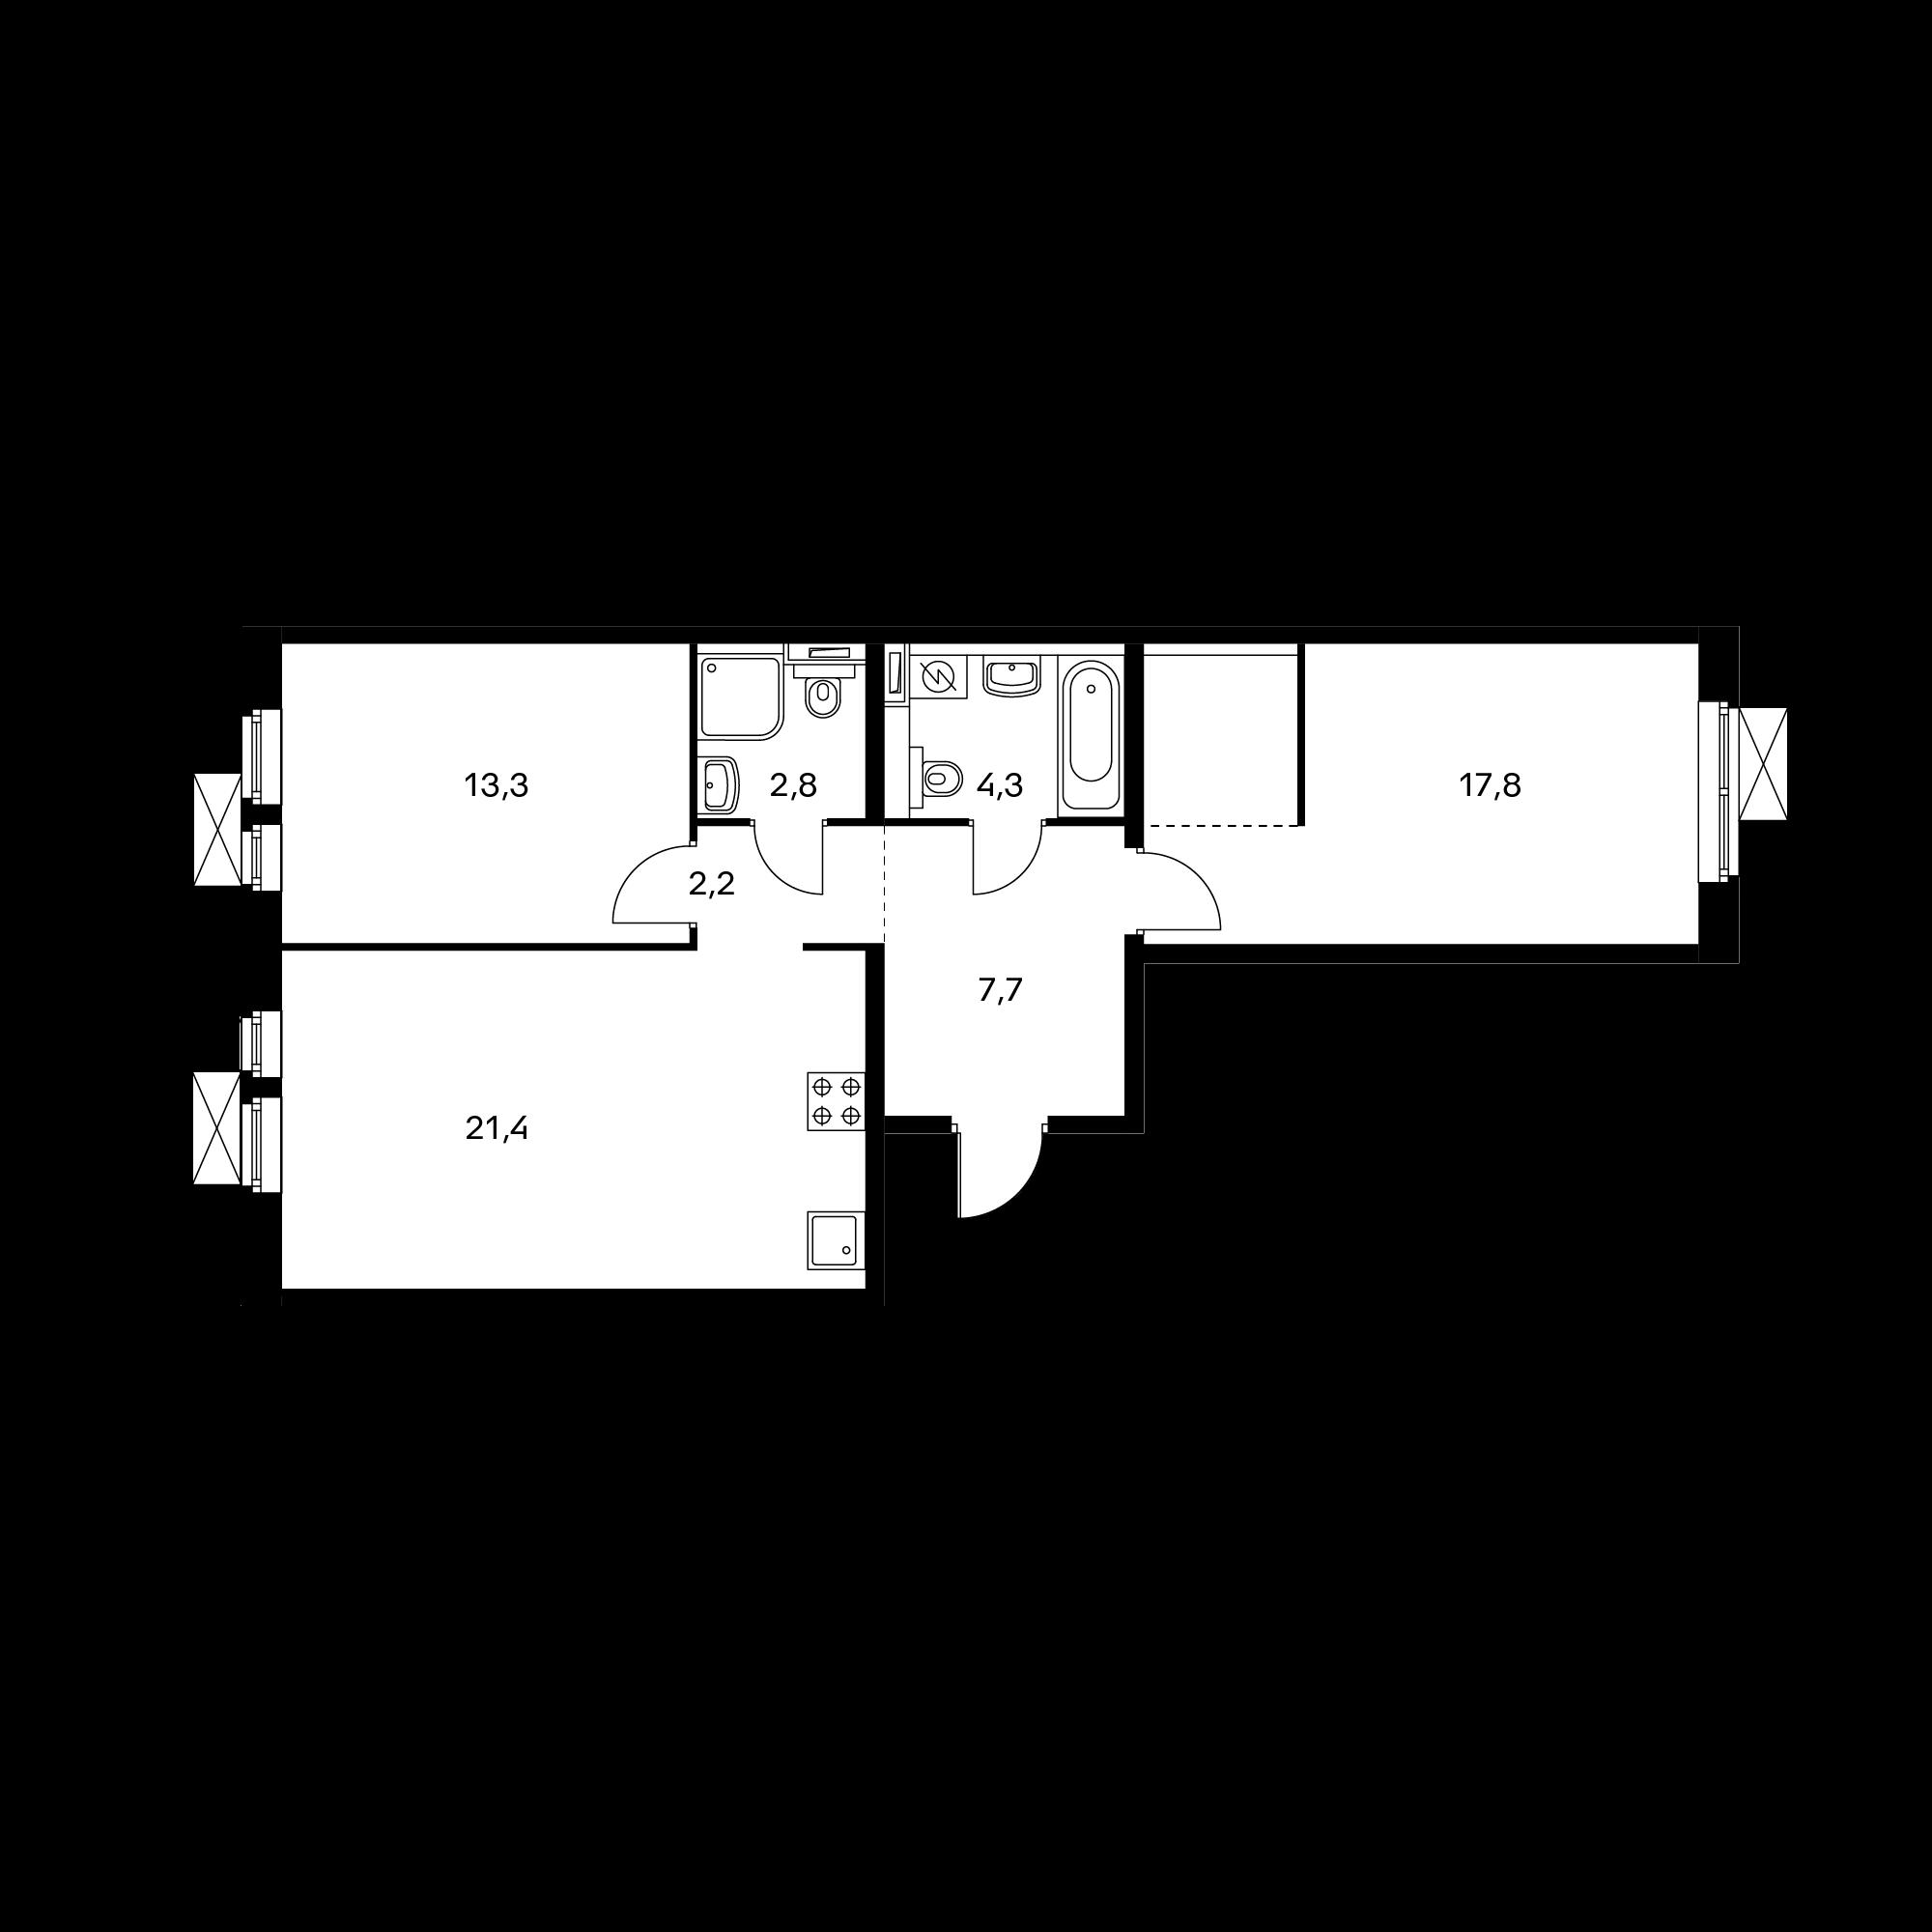 2EL10_6.9-1_1